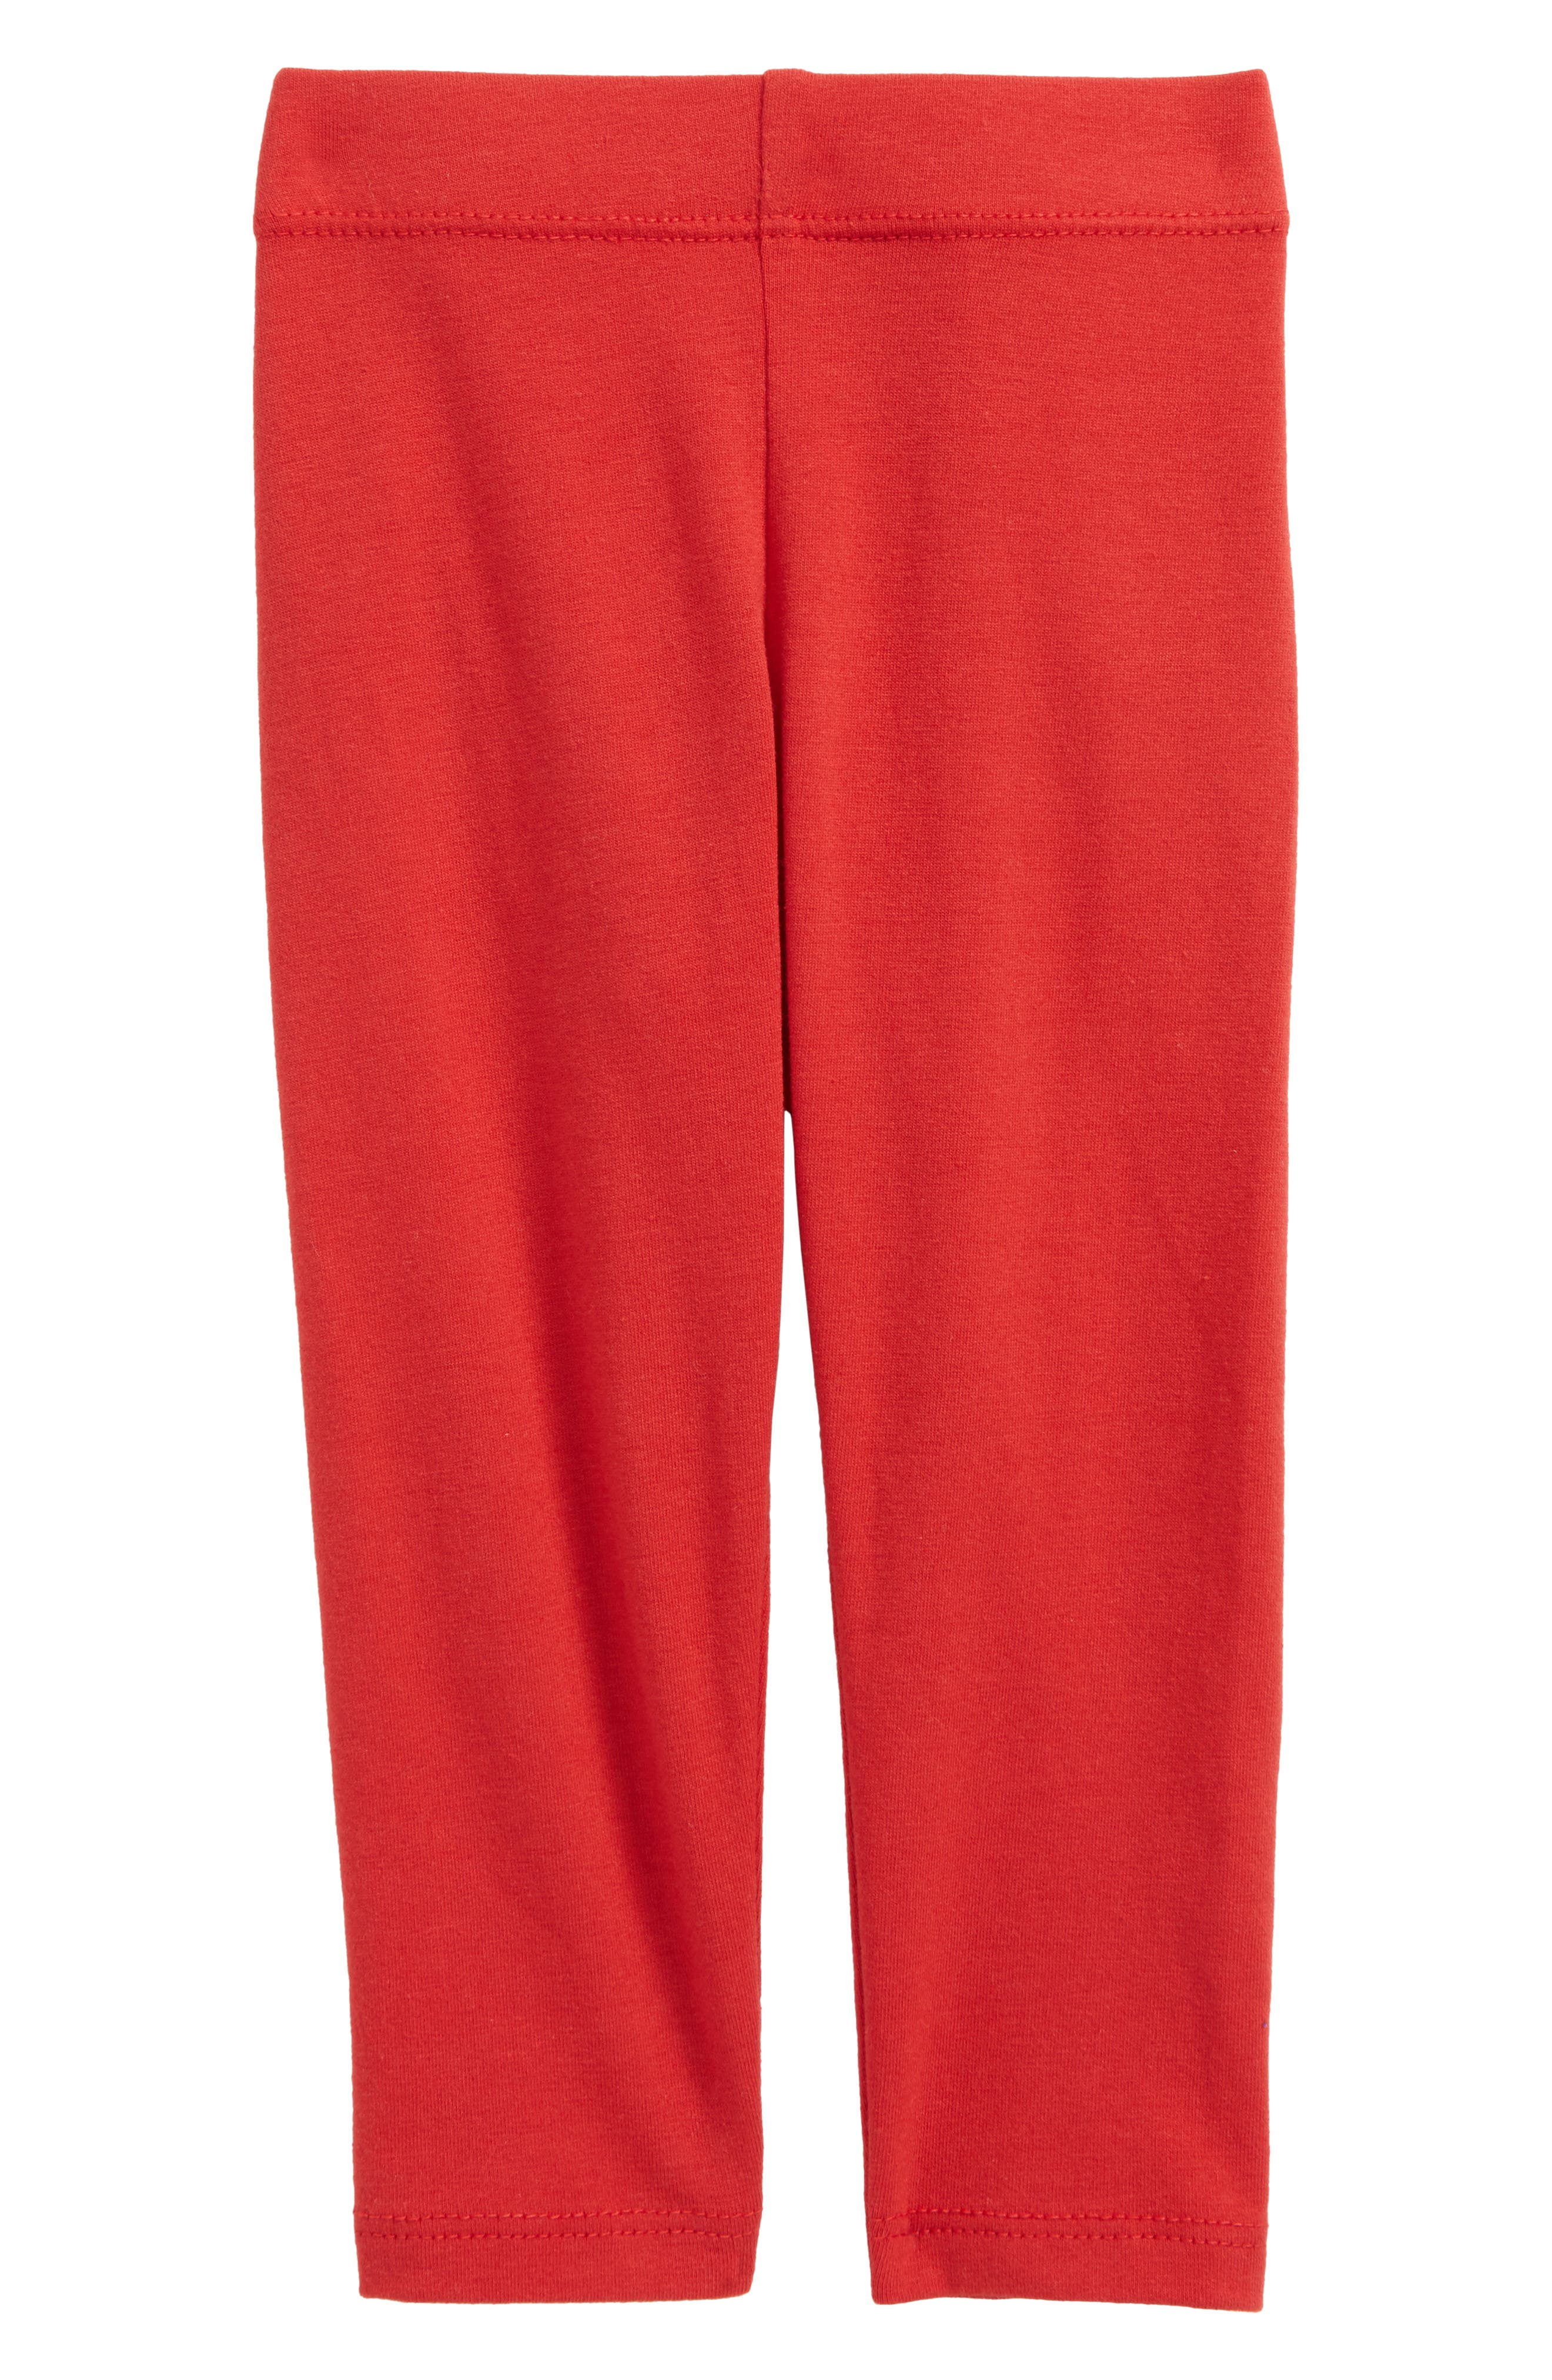 Essential Leggings,                         Main,                         color, Red Samba